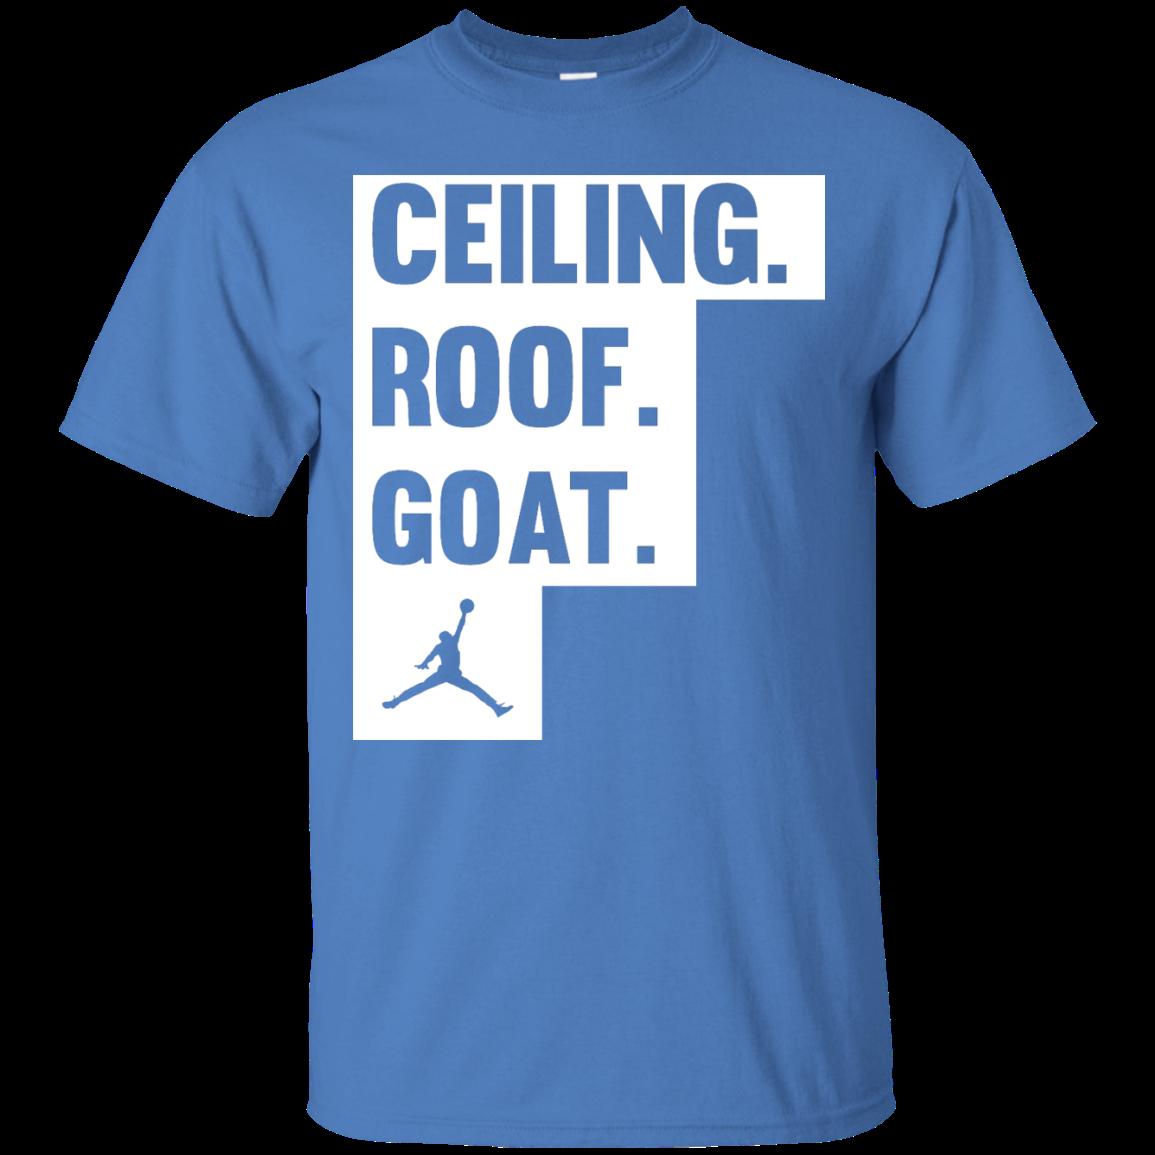 image 946px Jordan: Ceiling Roof Goat T Shirt, Hoodies, Tank